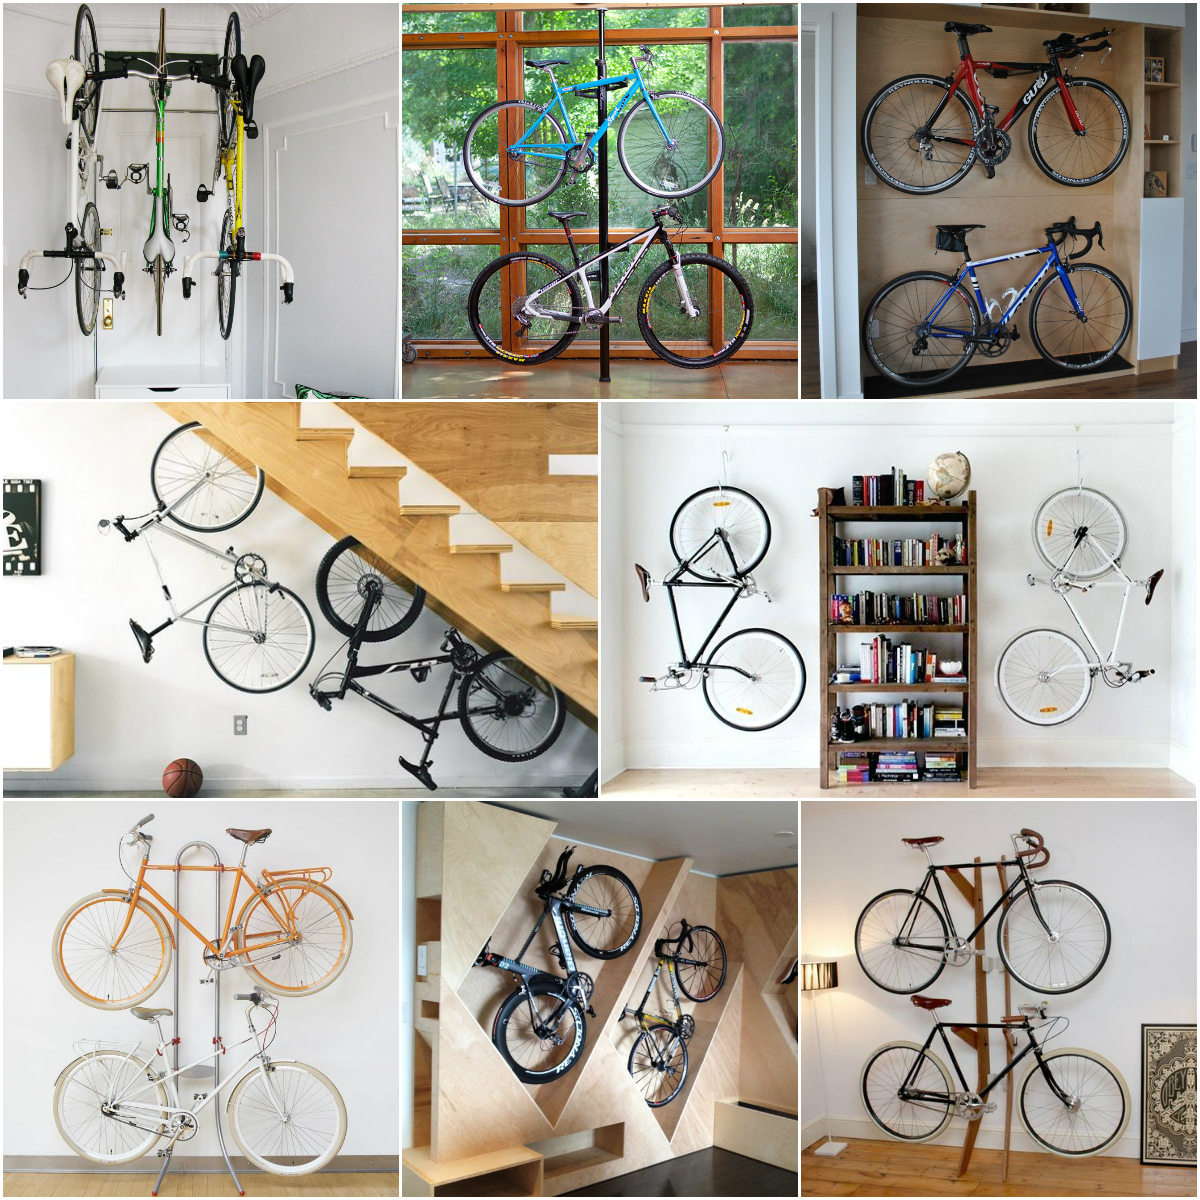 bicikli_tarolo.jpg